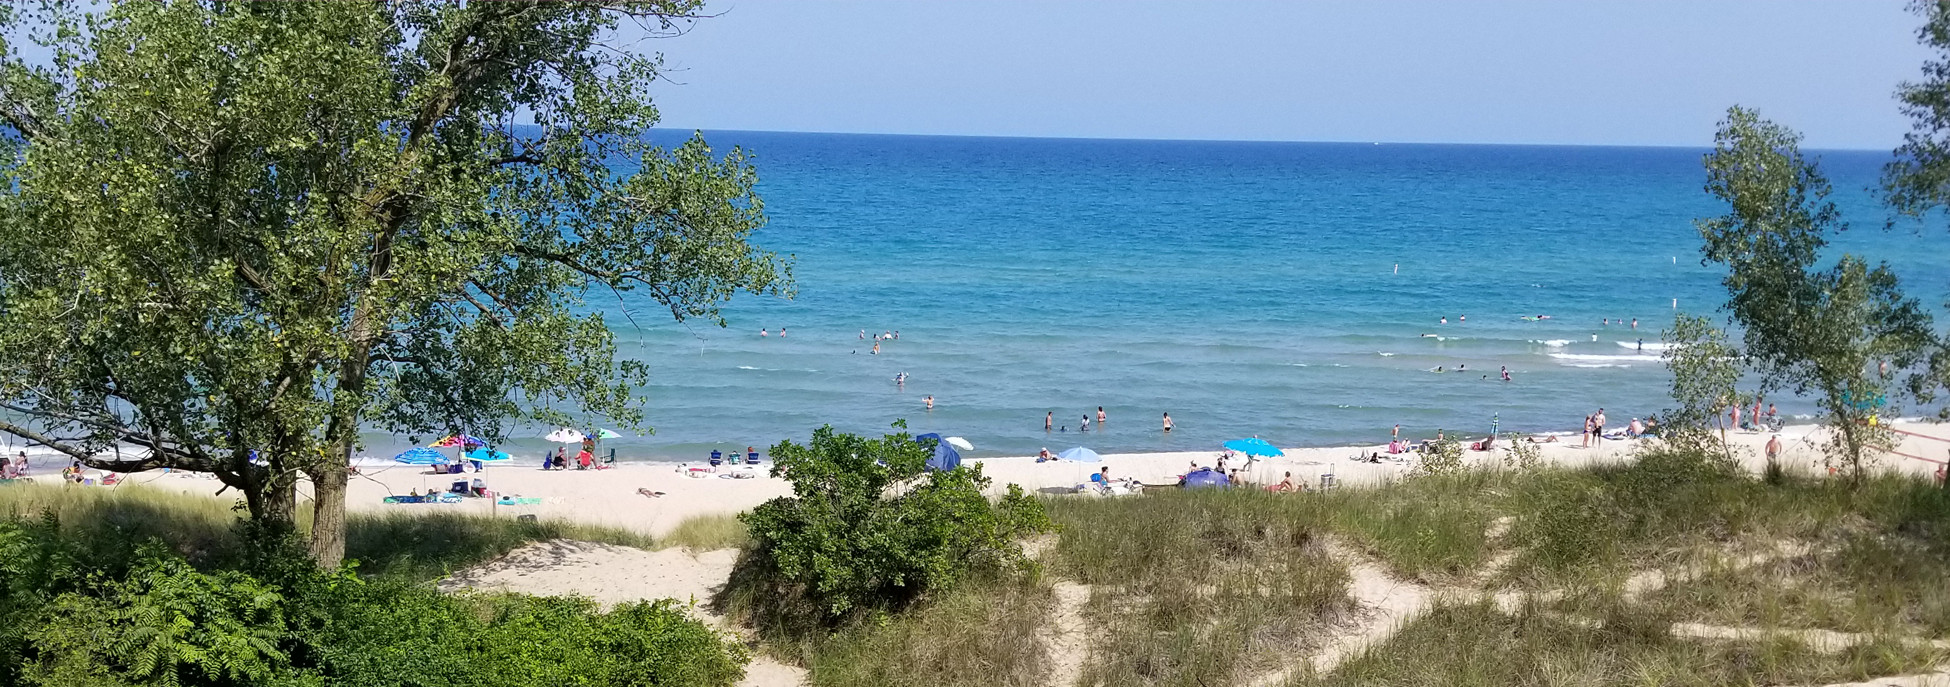 Porter Beach in Summer